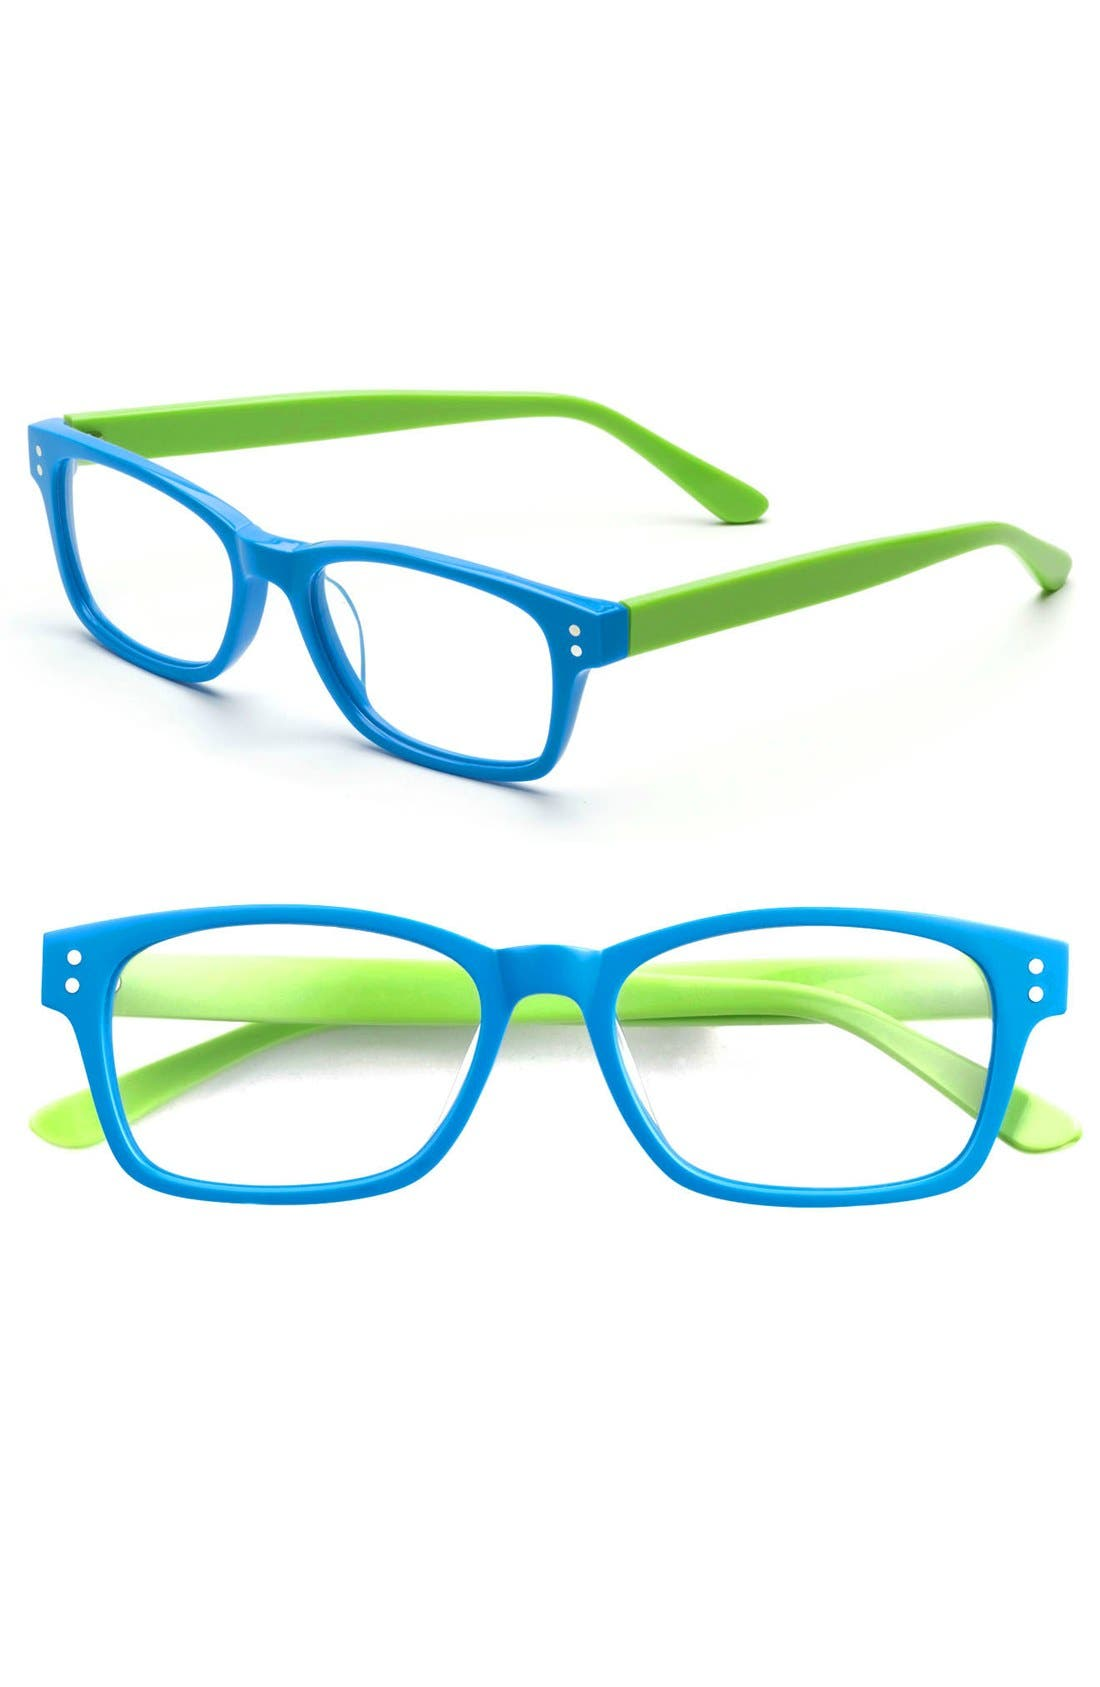 Alternate Image 1 Selected - Corinne McCormack 'Edie' Reading Glasses